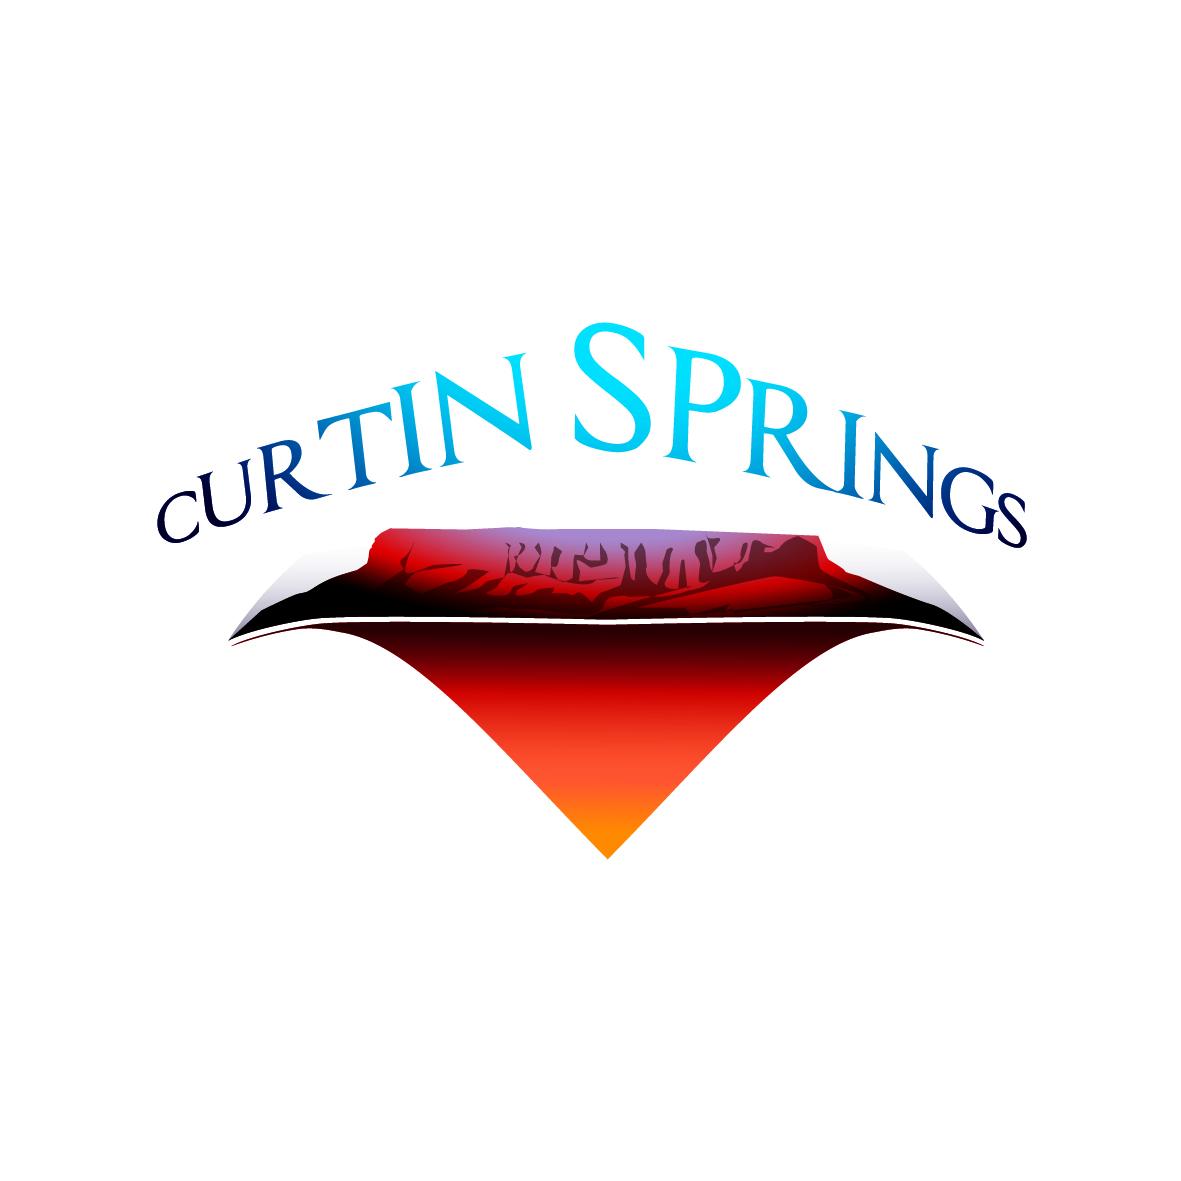 Curtin Springs